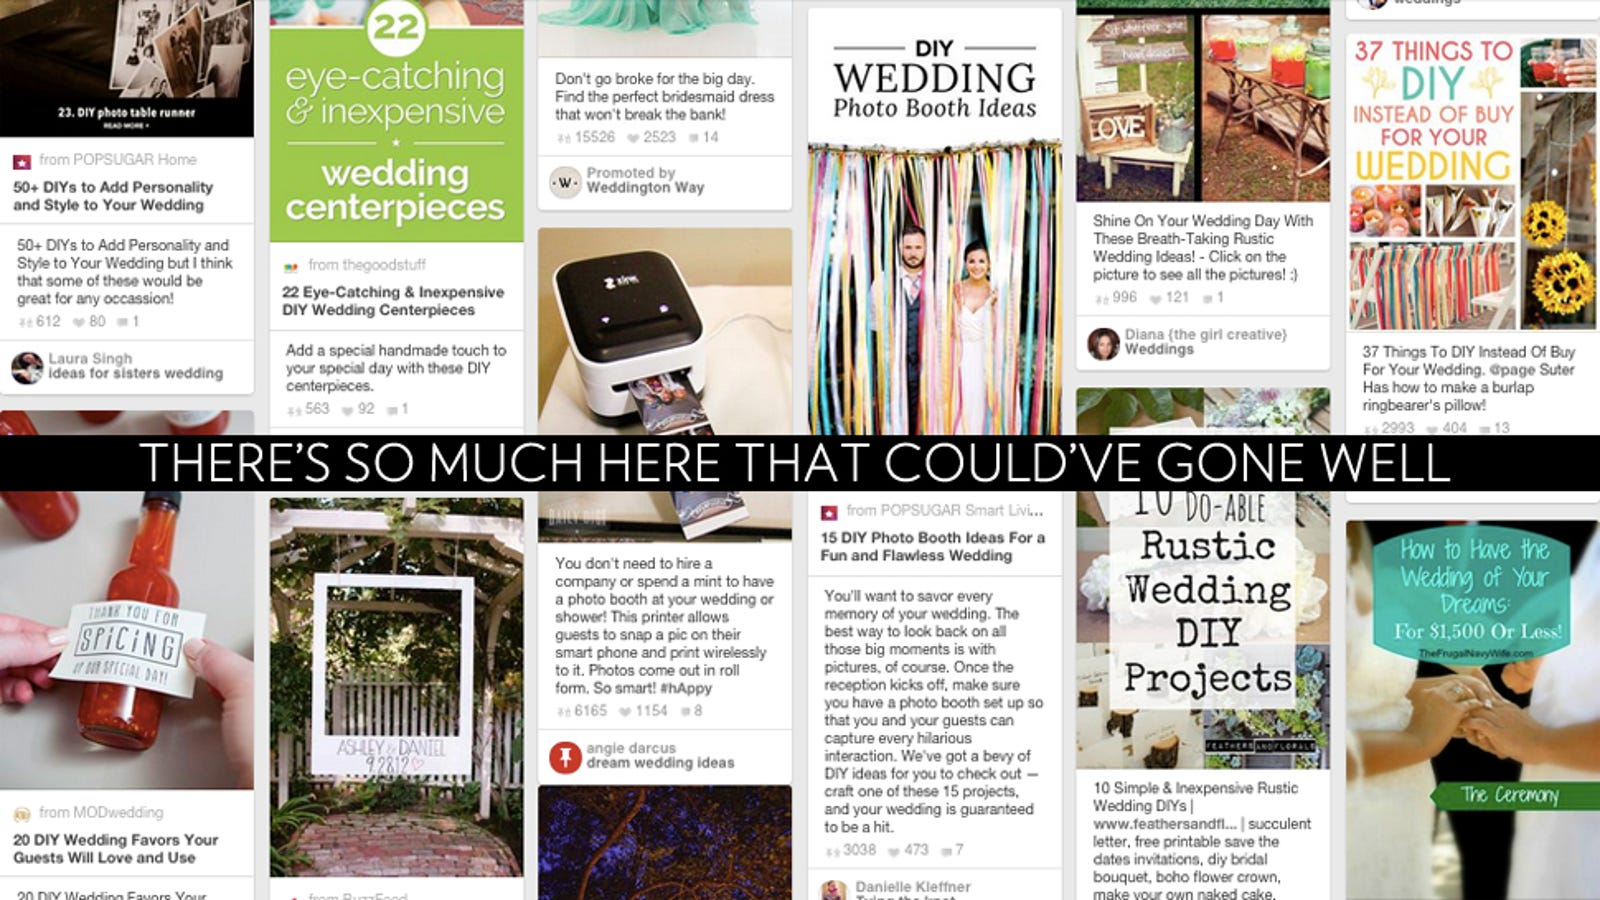 Five Godawful Wedding DIY Ideas From Pinterest